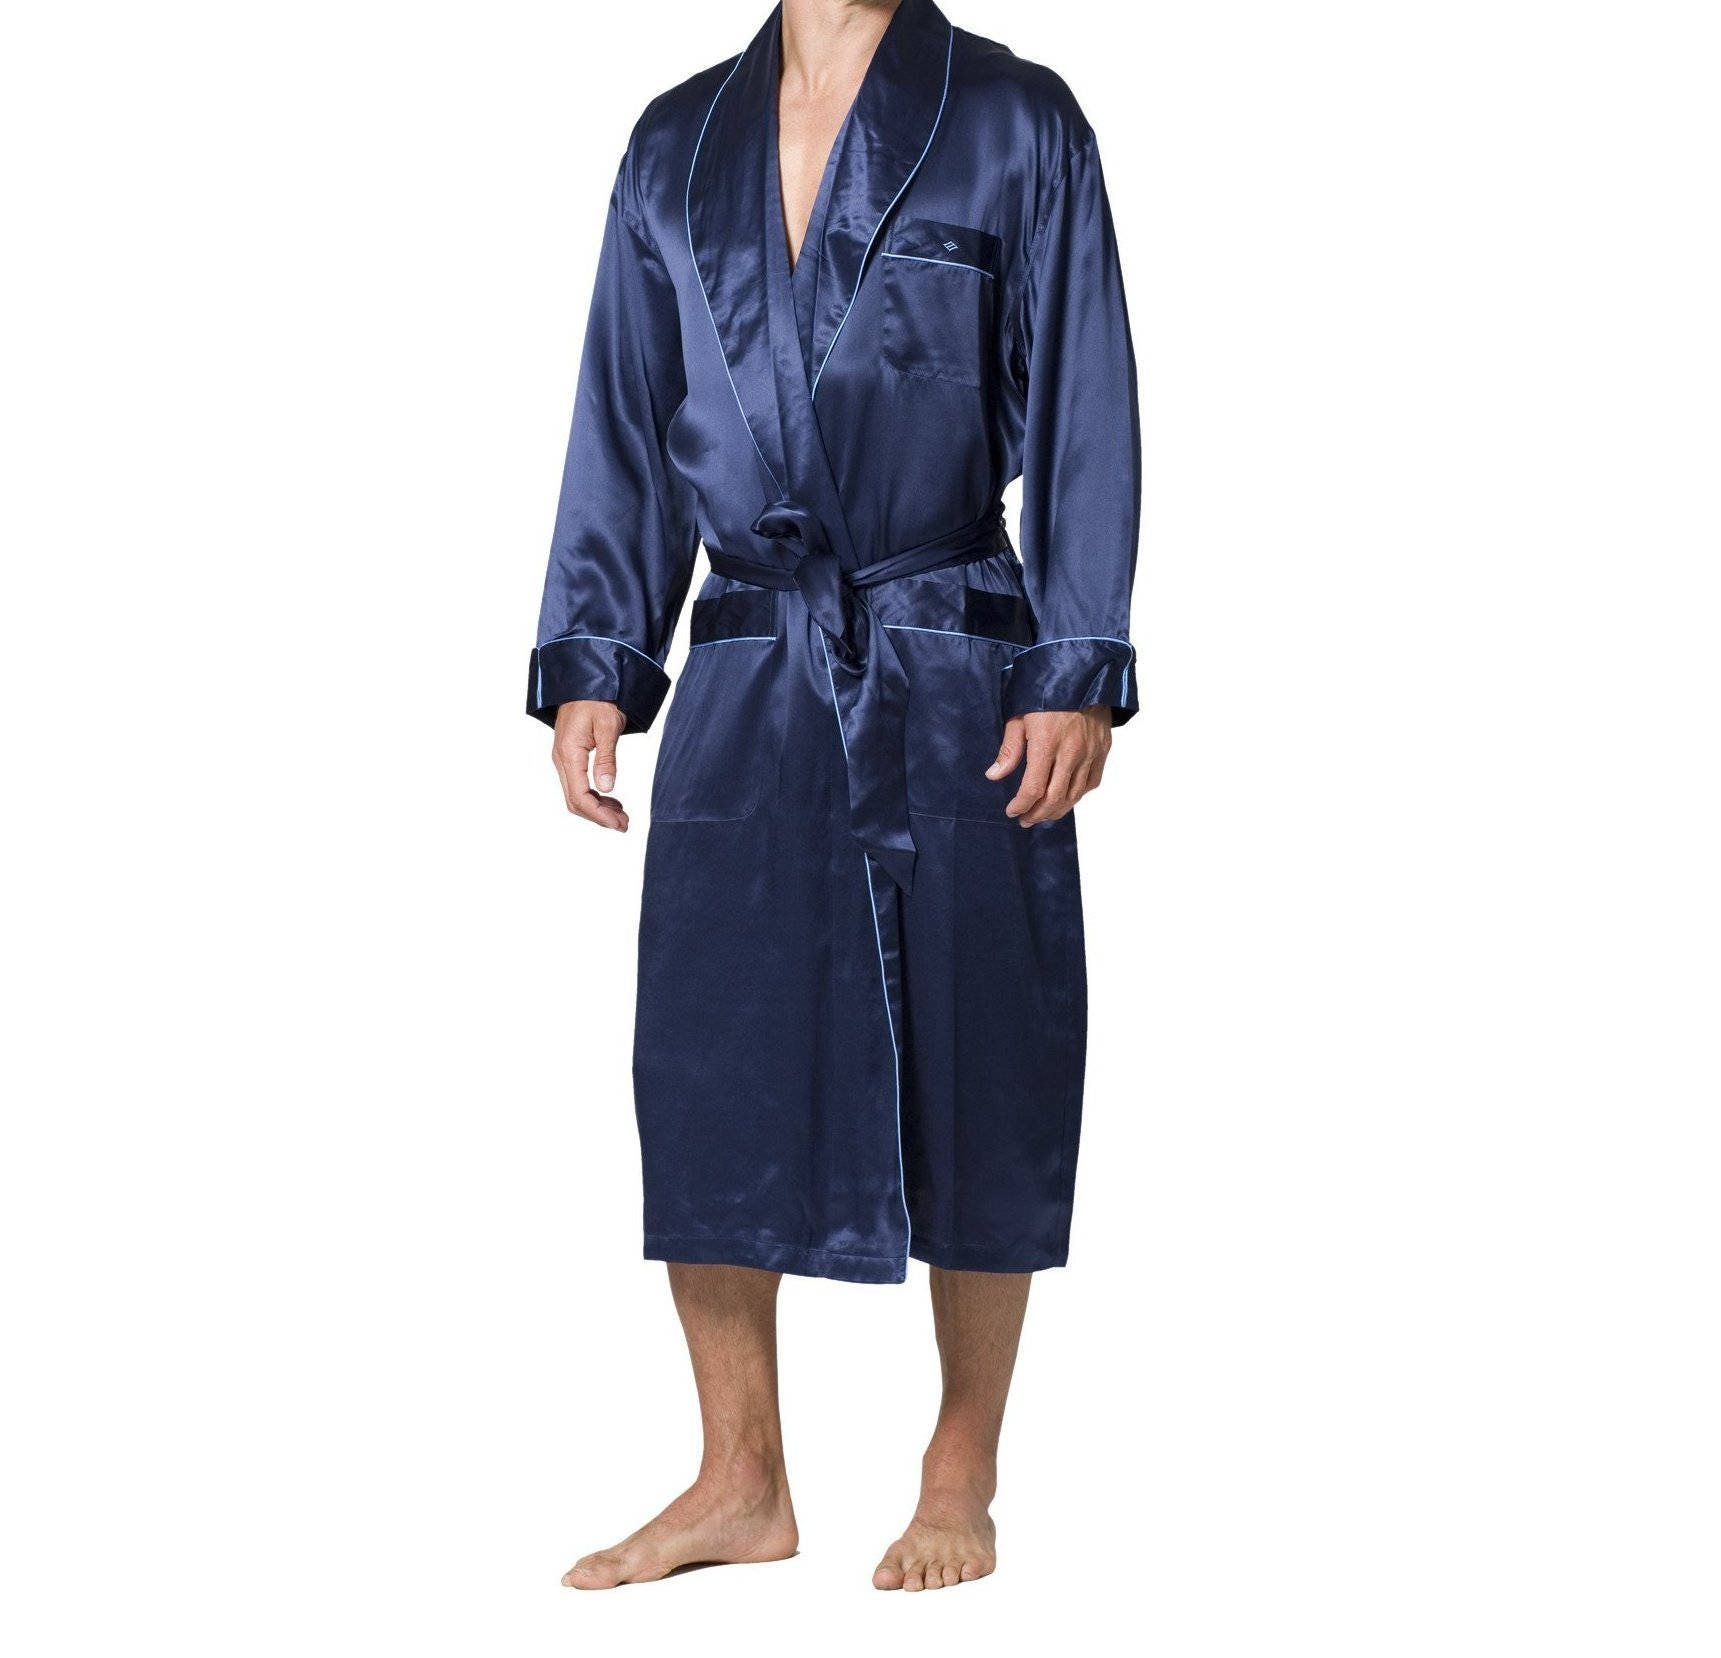 Mr Custom made robe robe made hommes, robe homme personnalisé, men monogrammée robes, robes brodées hommes, bêchage hommes peignoirs, pyjama homme, pyjama homme 42acf9